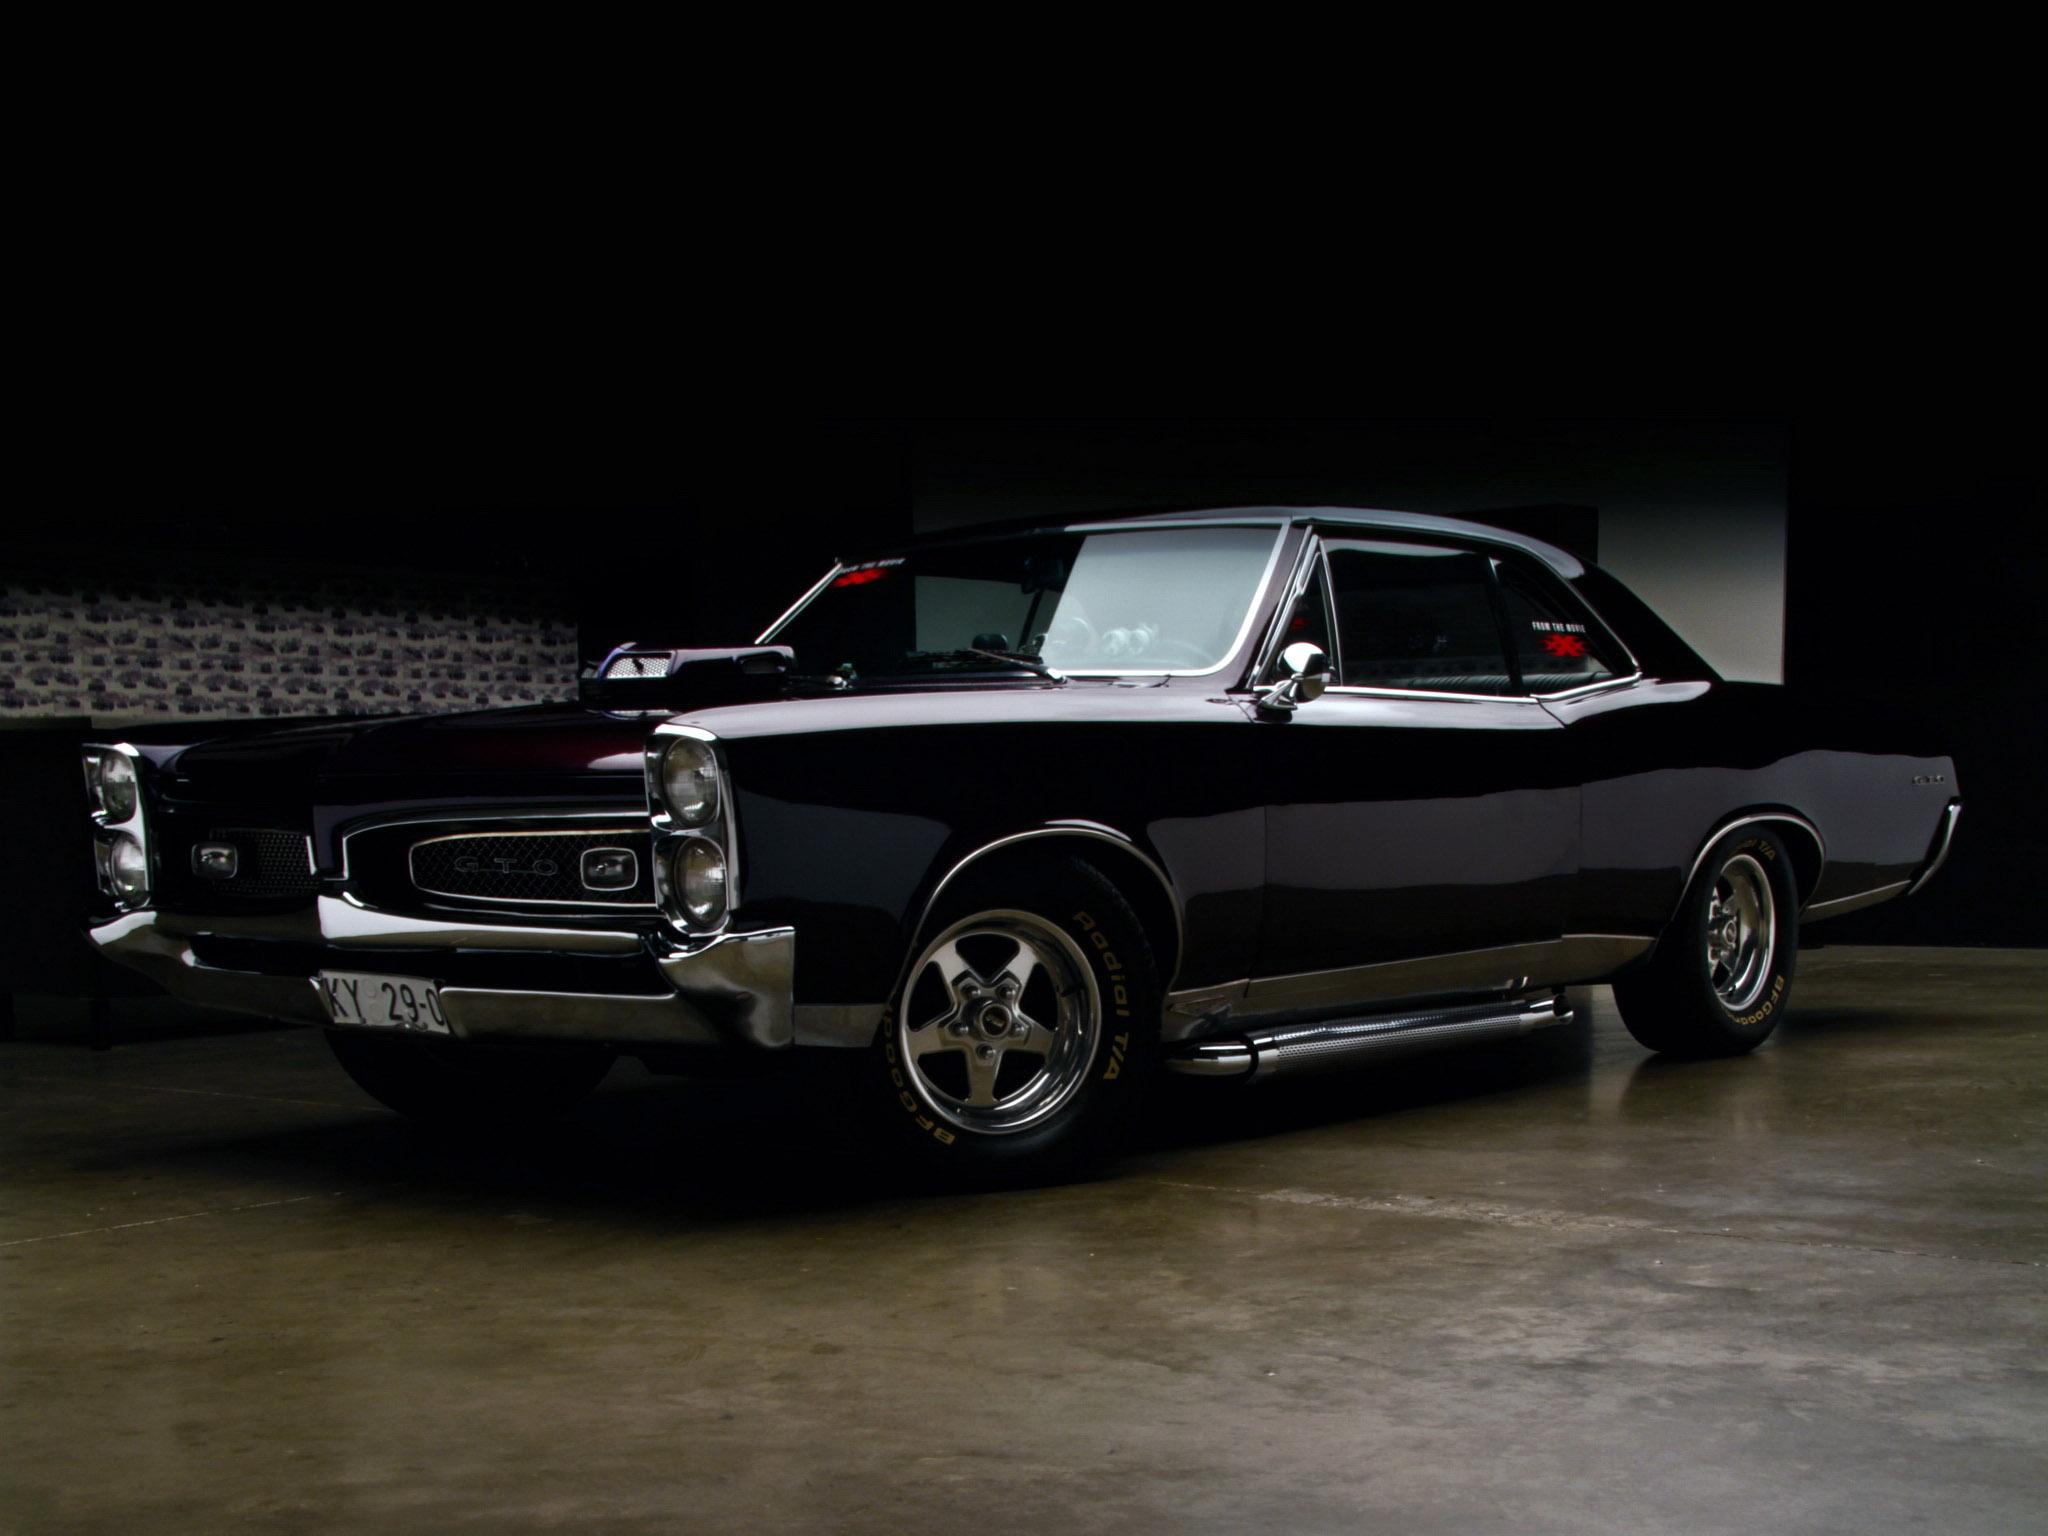 1967 Pontiac Tempest GTO xXx hot rod rods muscle classic f wallpaper 2048x1536